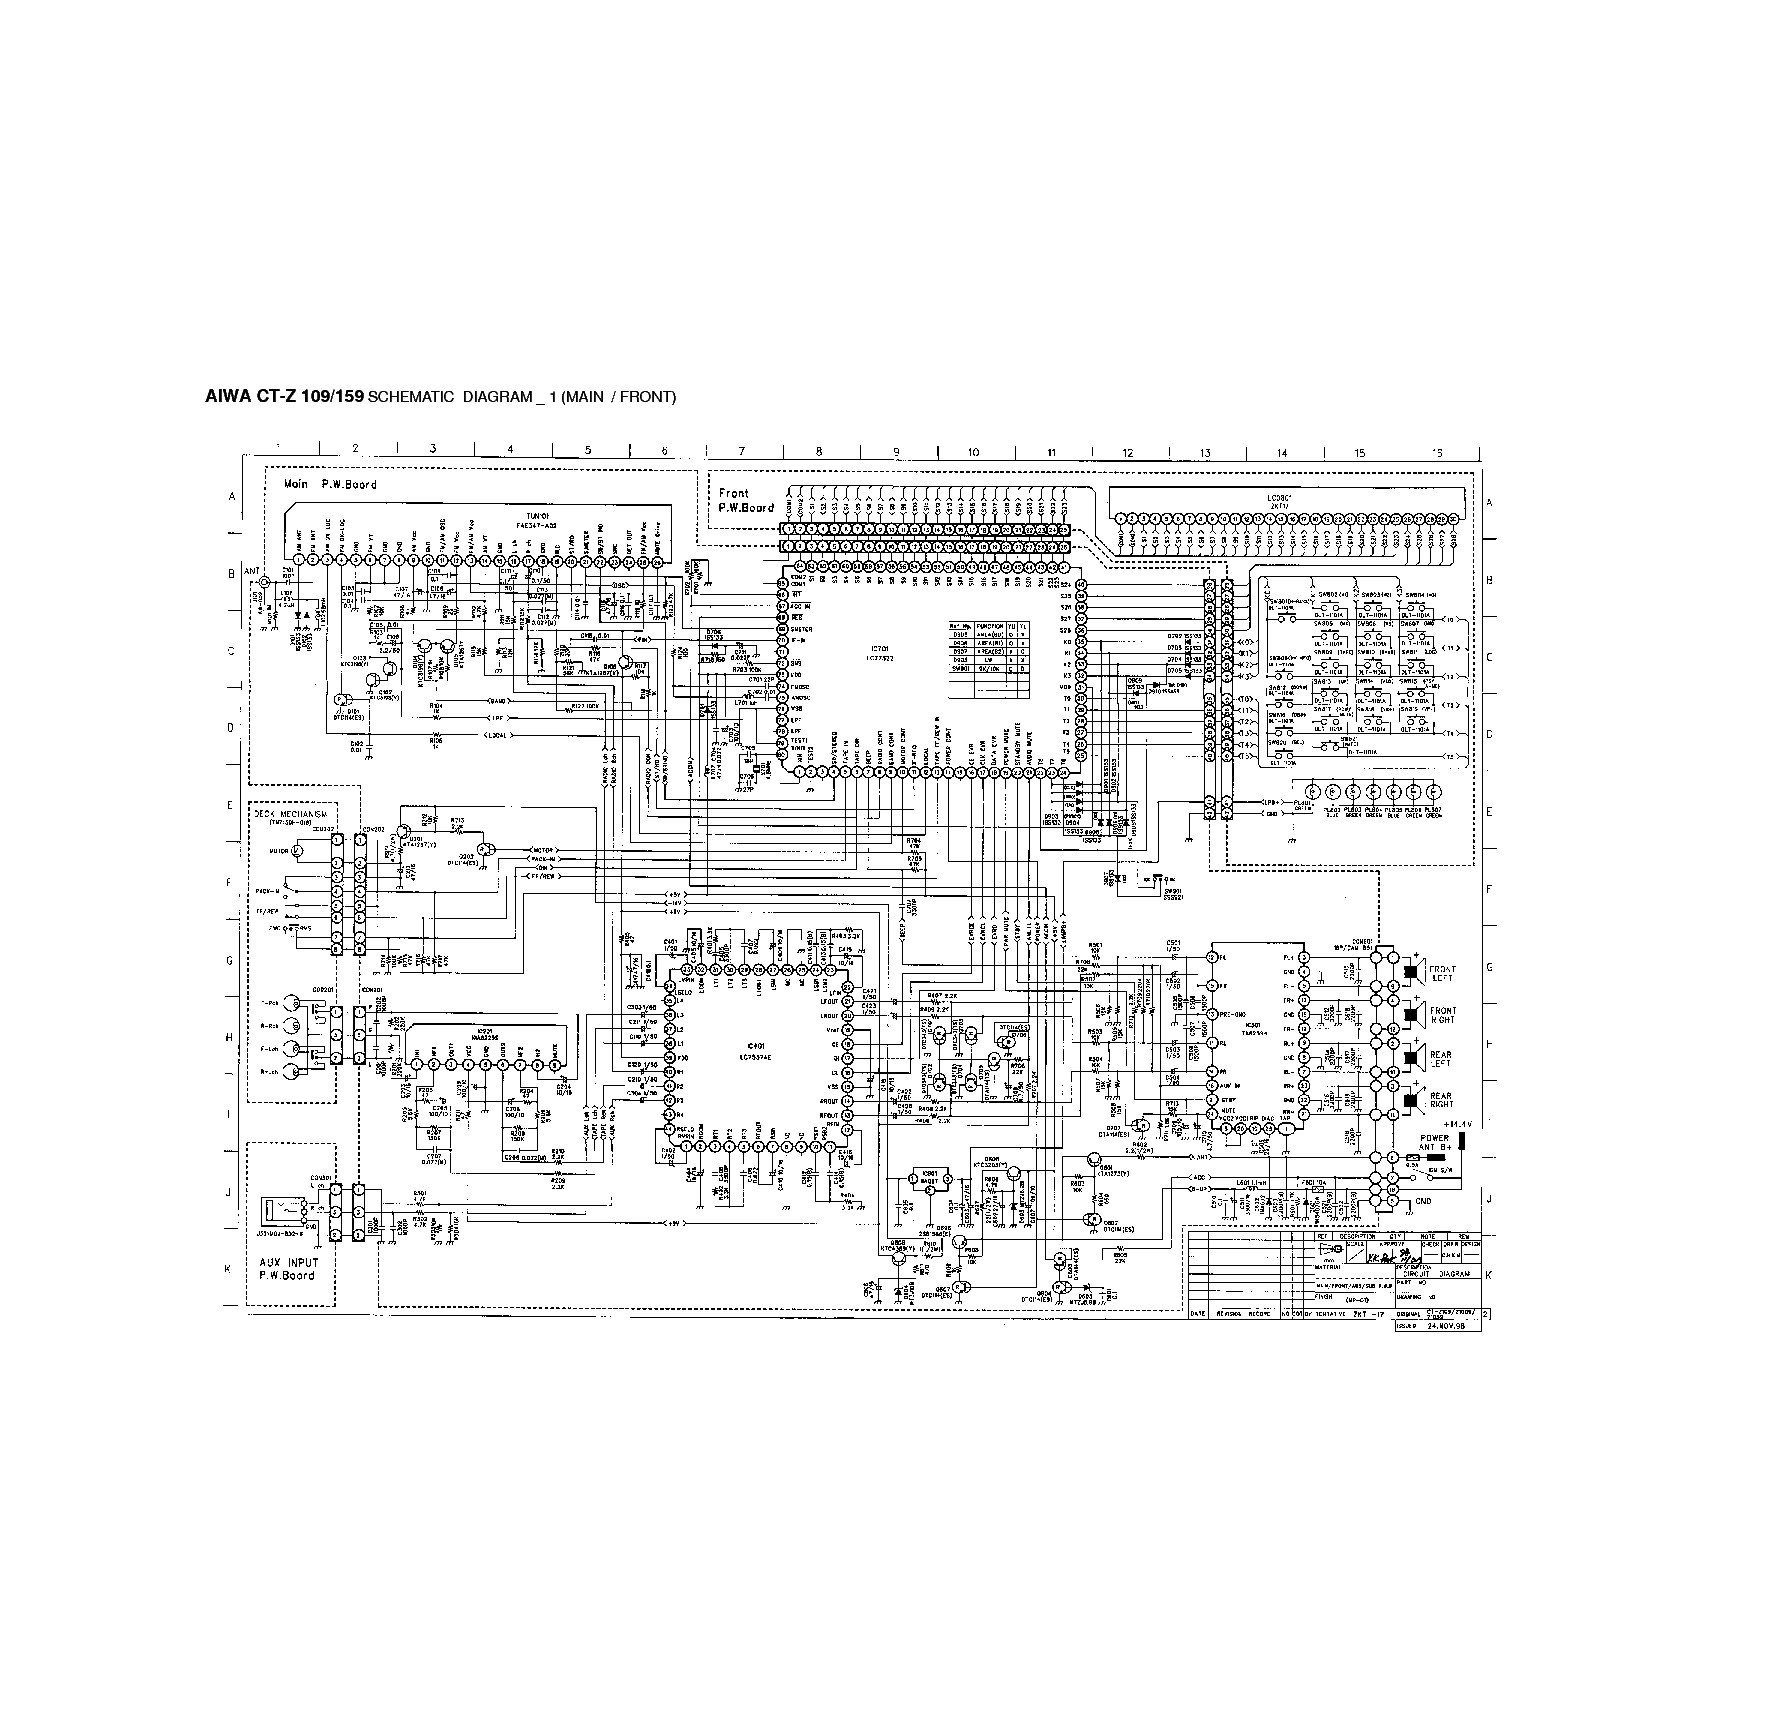 AIWA-CT-Z-109-159 service manual (1st page)